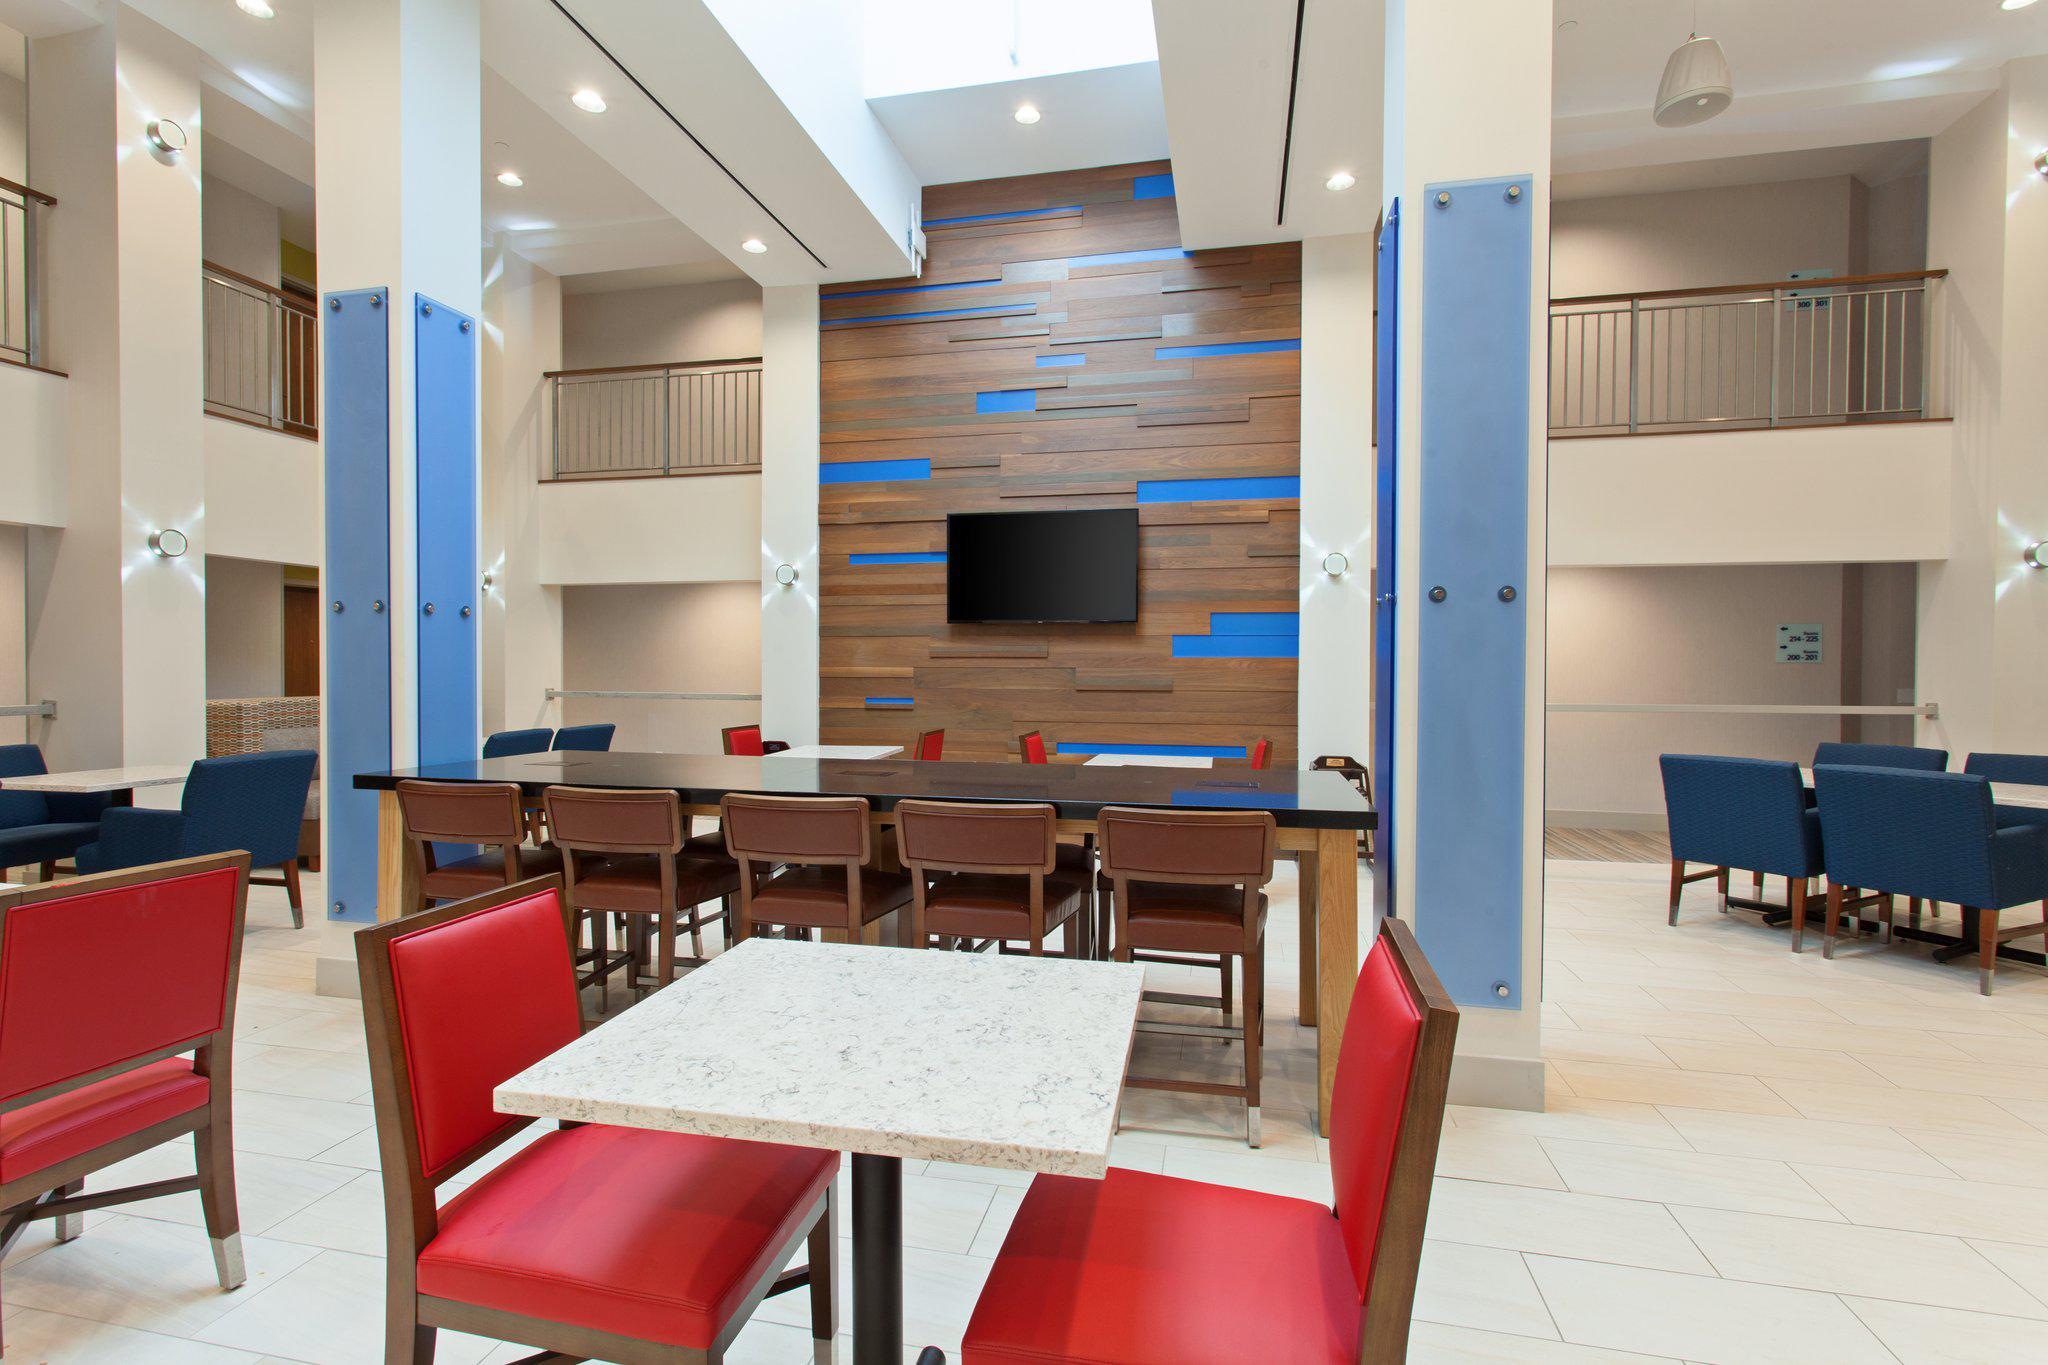 Holiday Inn Express West Los Angeles-Santa Monica, an IHG Hotel